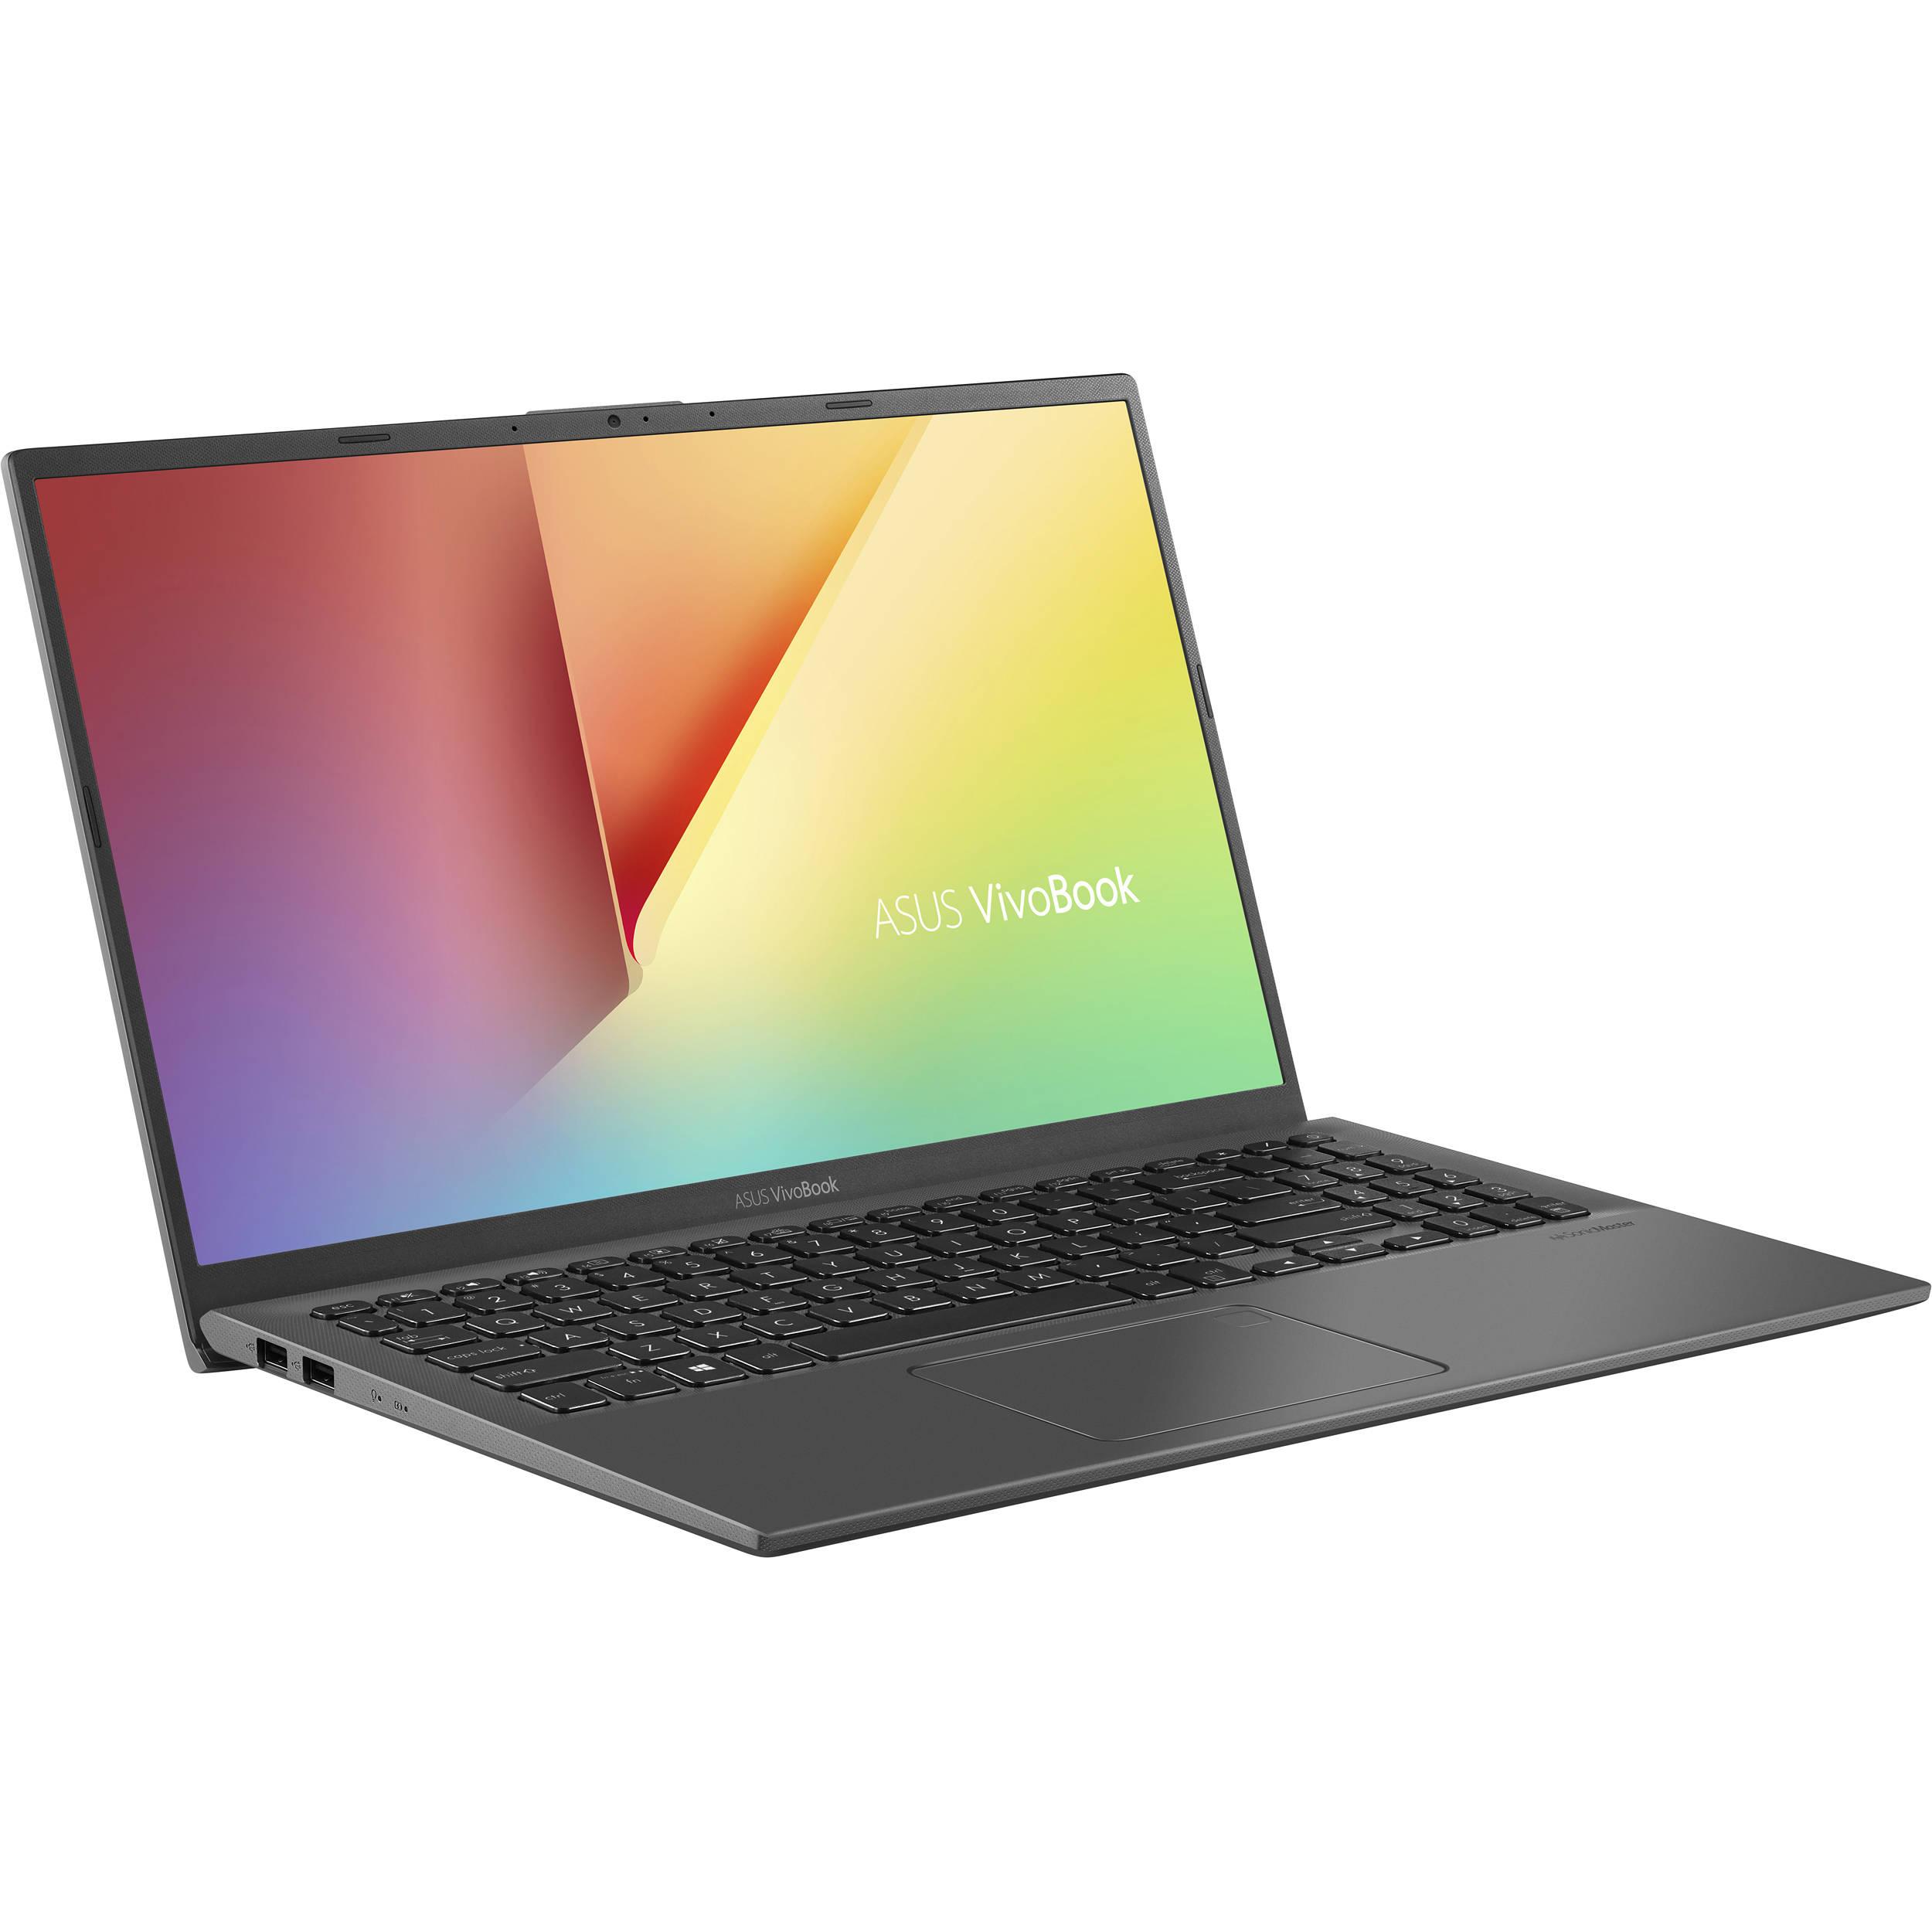 Asus 15 6 Vivobook 15 F512da Laptop F512da Rs51 B H